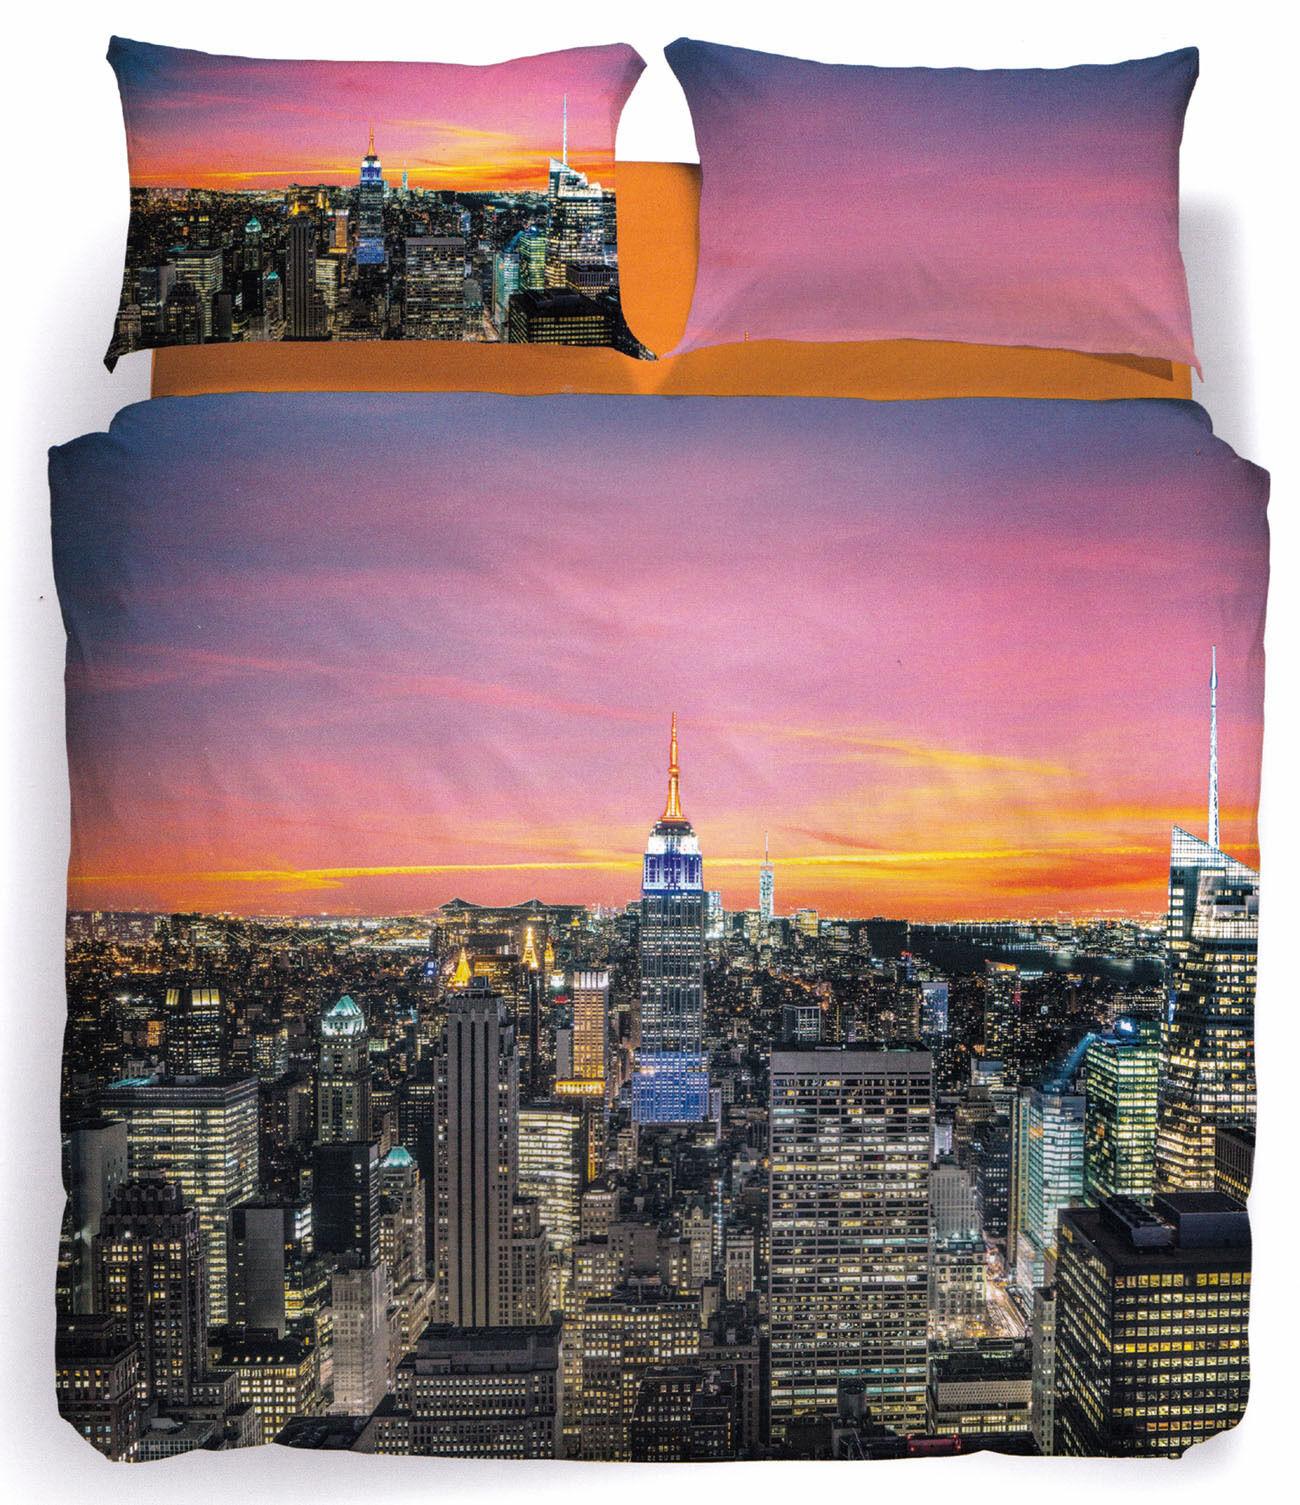 Set Copripiumino Lenzuola New York Sunset City 1 Piazza e Mezza Digitale Caleffi